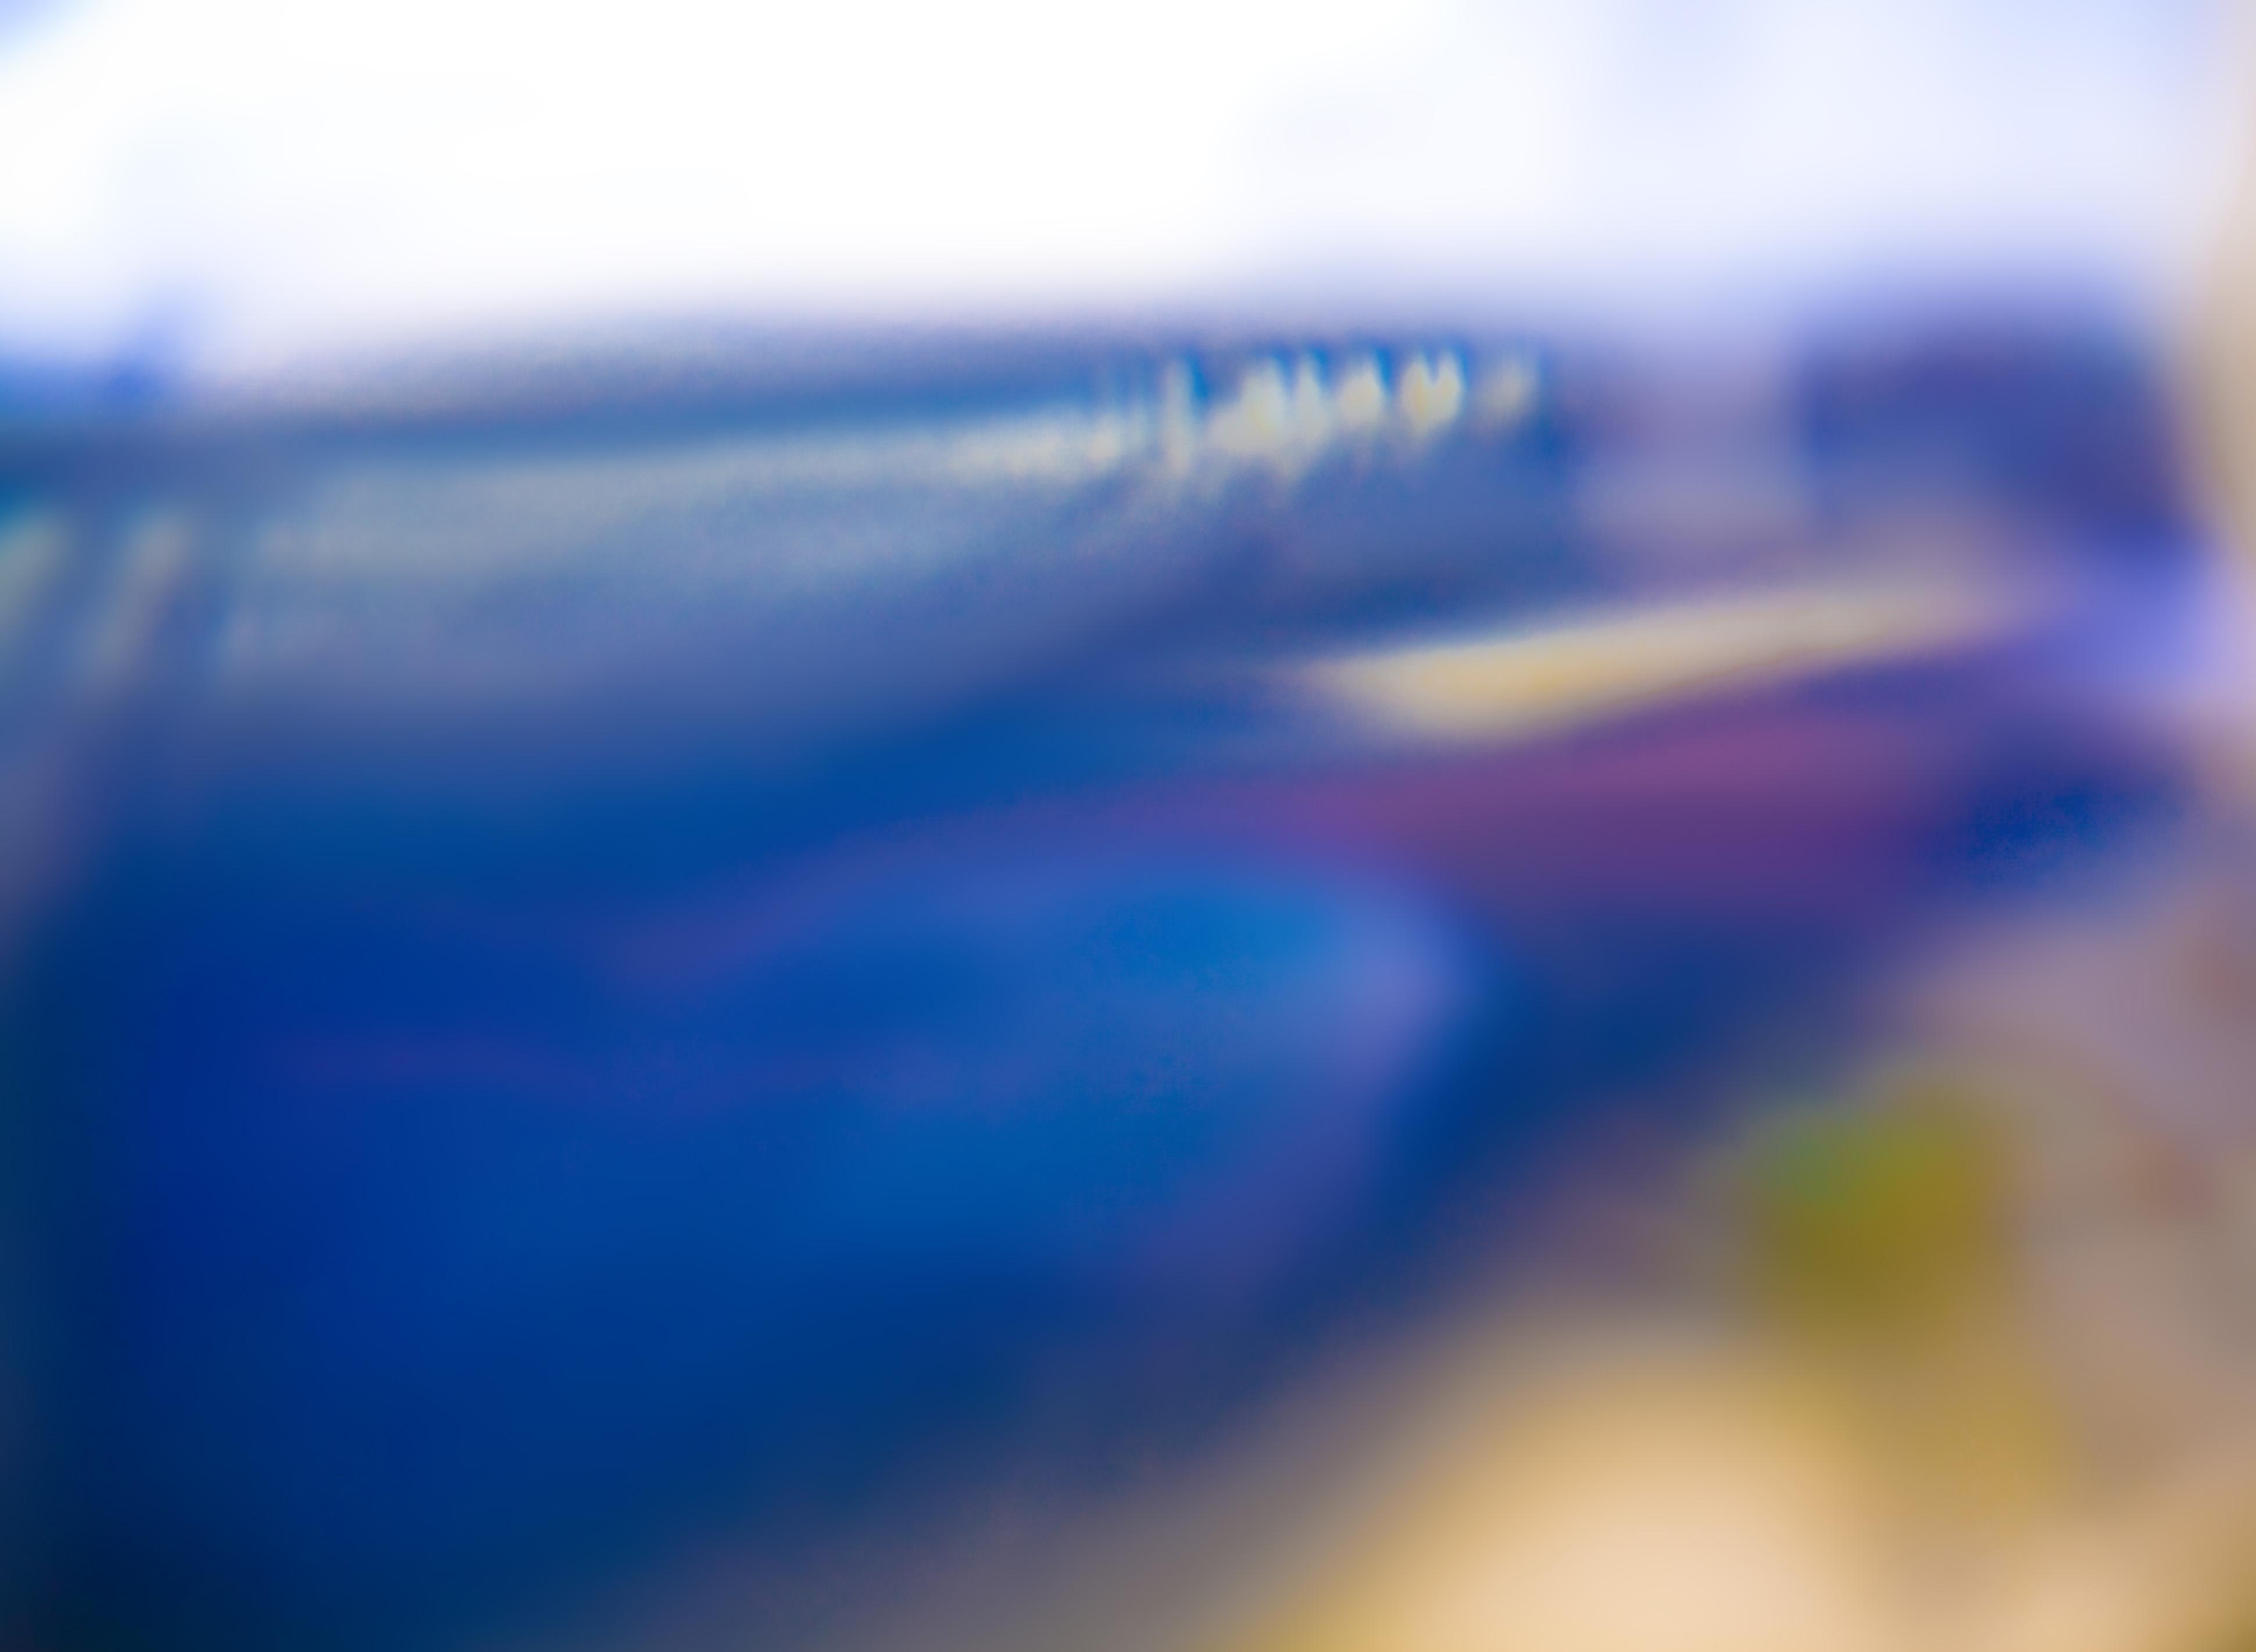 Still_Fotografie_Kunst_Blau_Stills_Ralf_ Lindenau_5